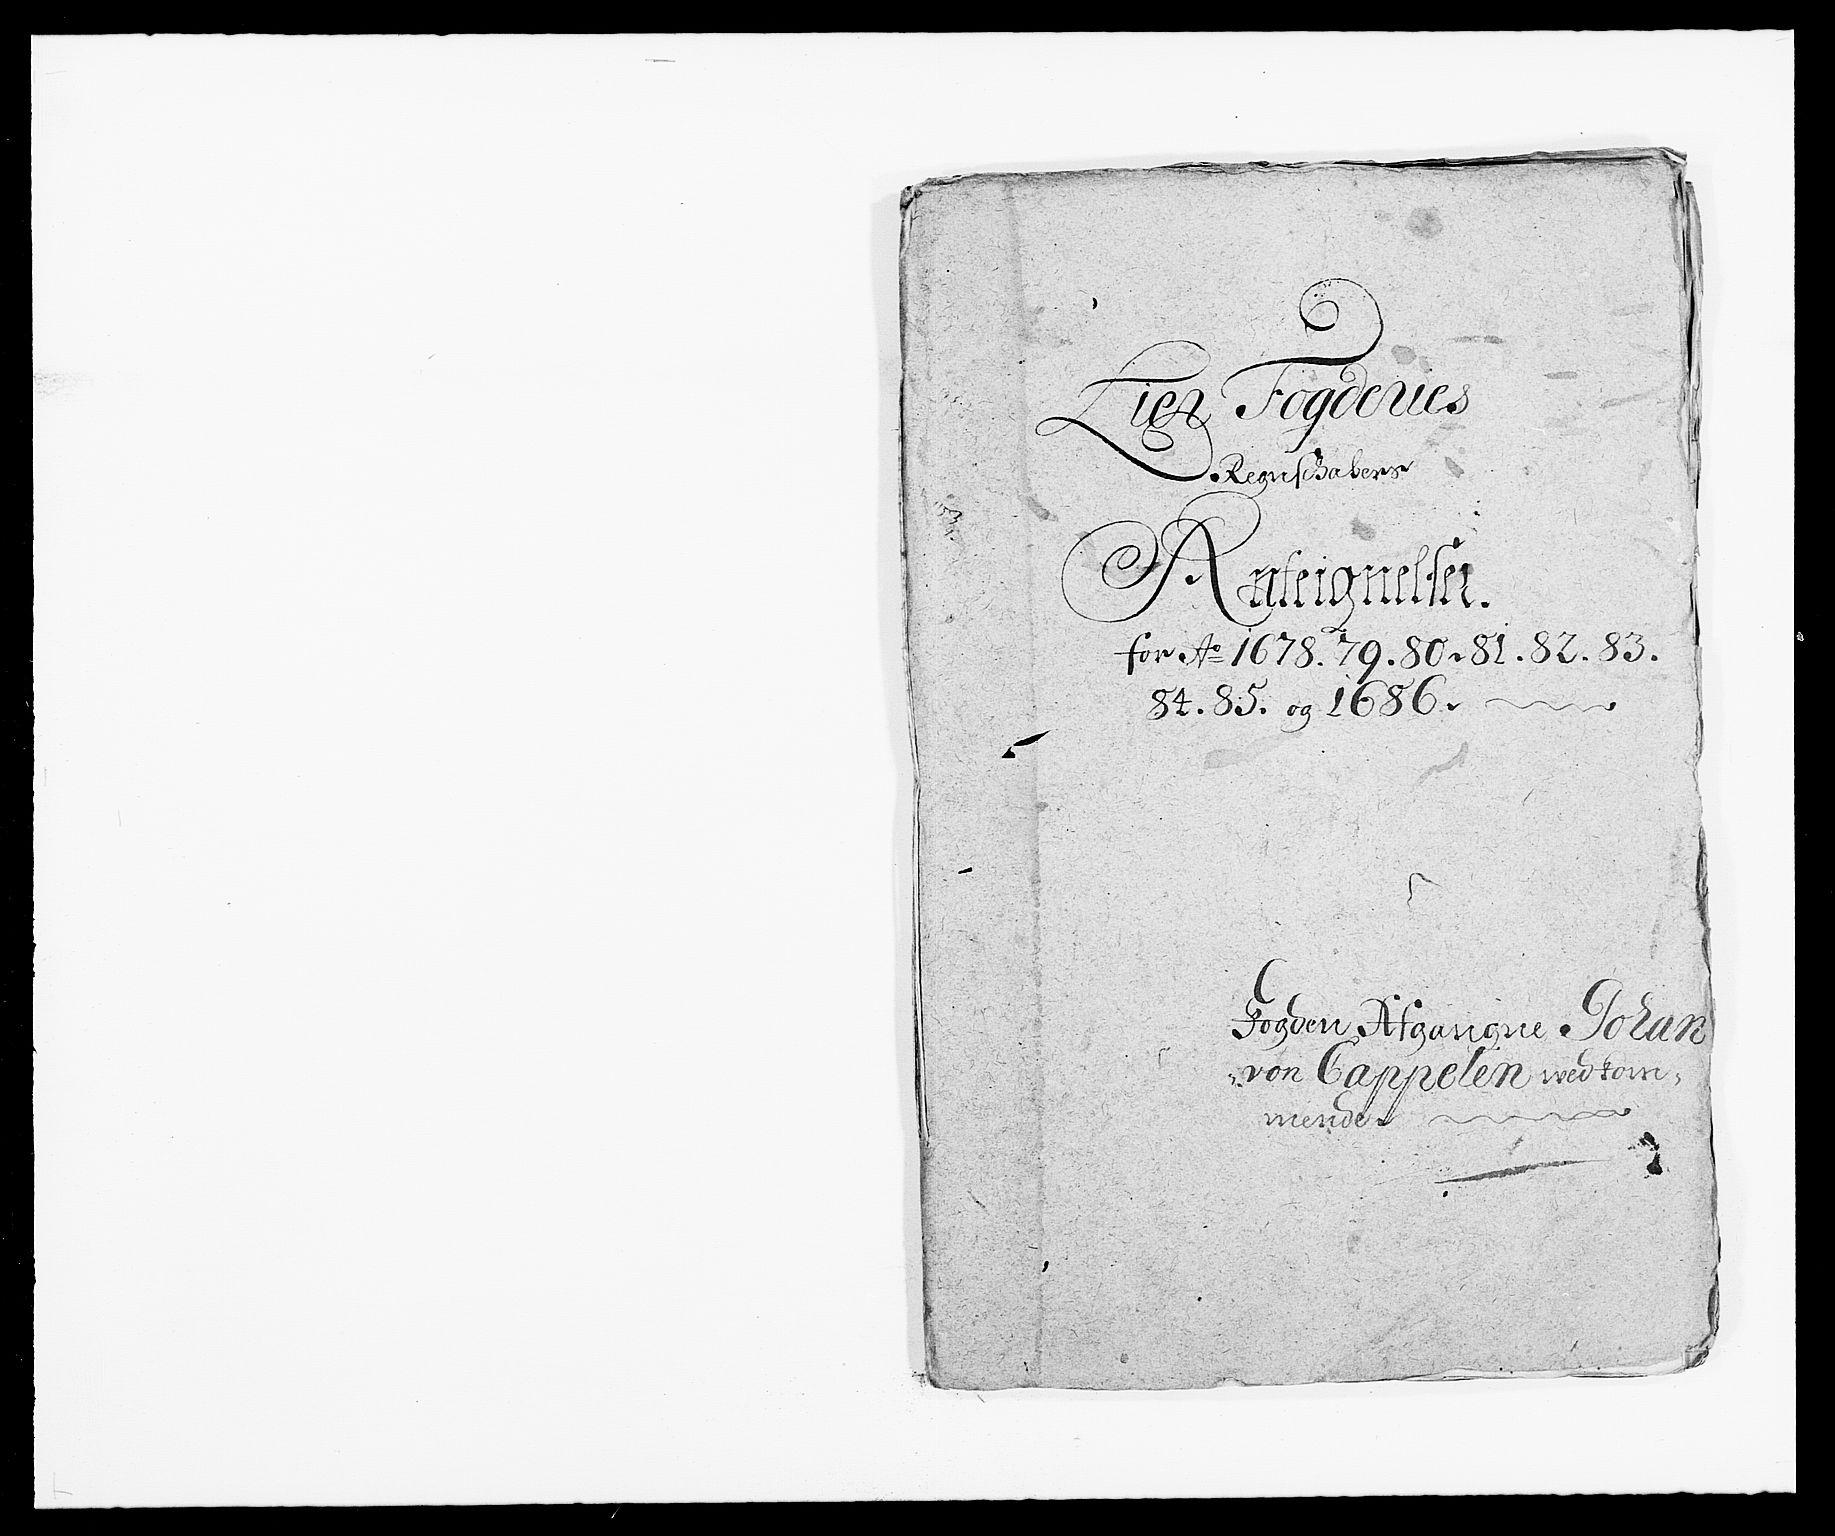 RA, Rentekammeret inntil 1814, Reviderte regnskaper, Fogderegnskap, R27/L1687: Fogderegnskap Lier, 1678-1686, s. 375